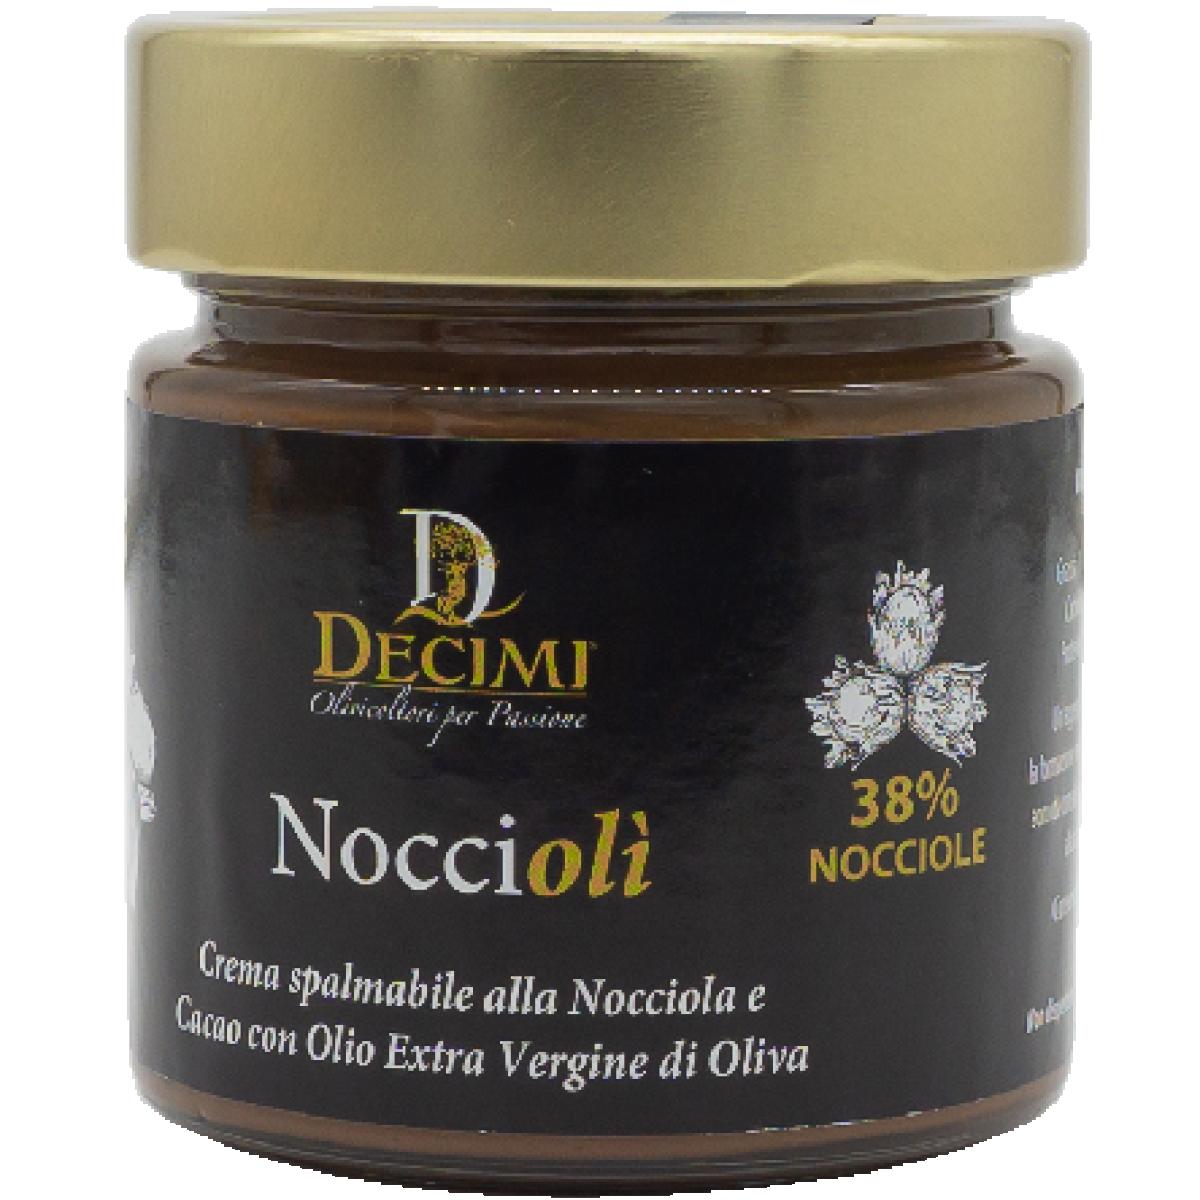 Haselnuss-Olivenöl-Creme, 250g Glas